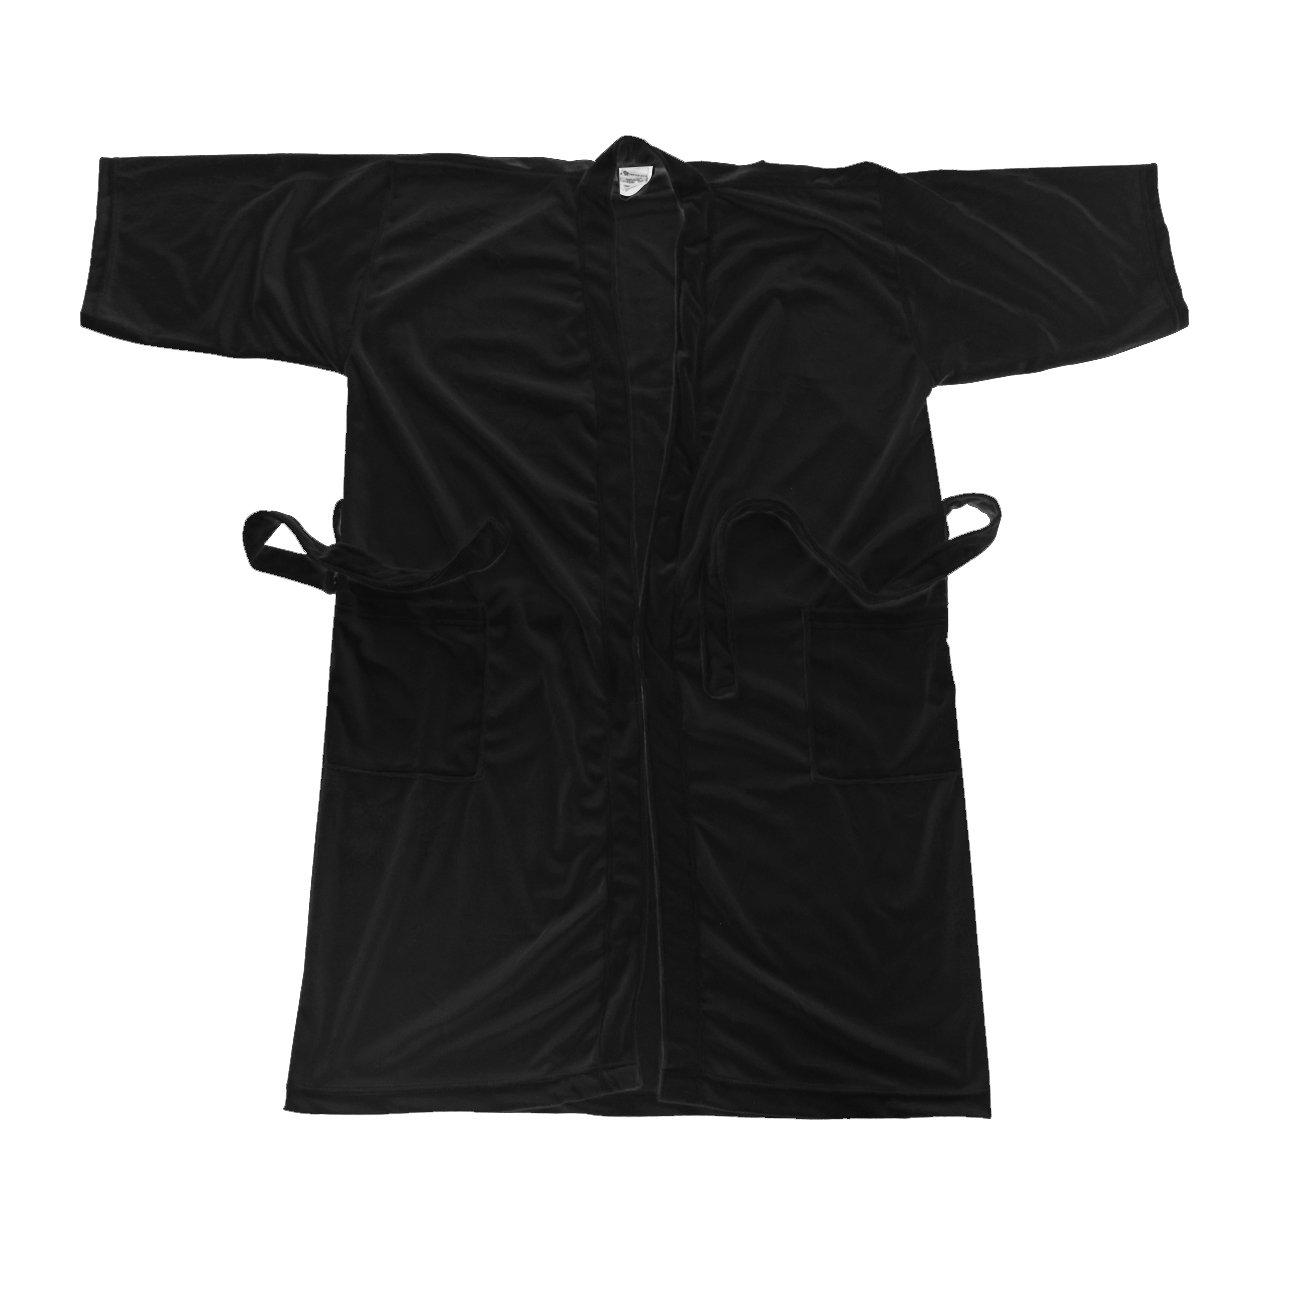 18c2278a33 Amazon.com: Canyon Rose Cloud 9 Men's Plush Microfiber Spa Robe, Black Sea,  M/L: Beauty